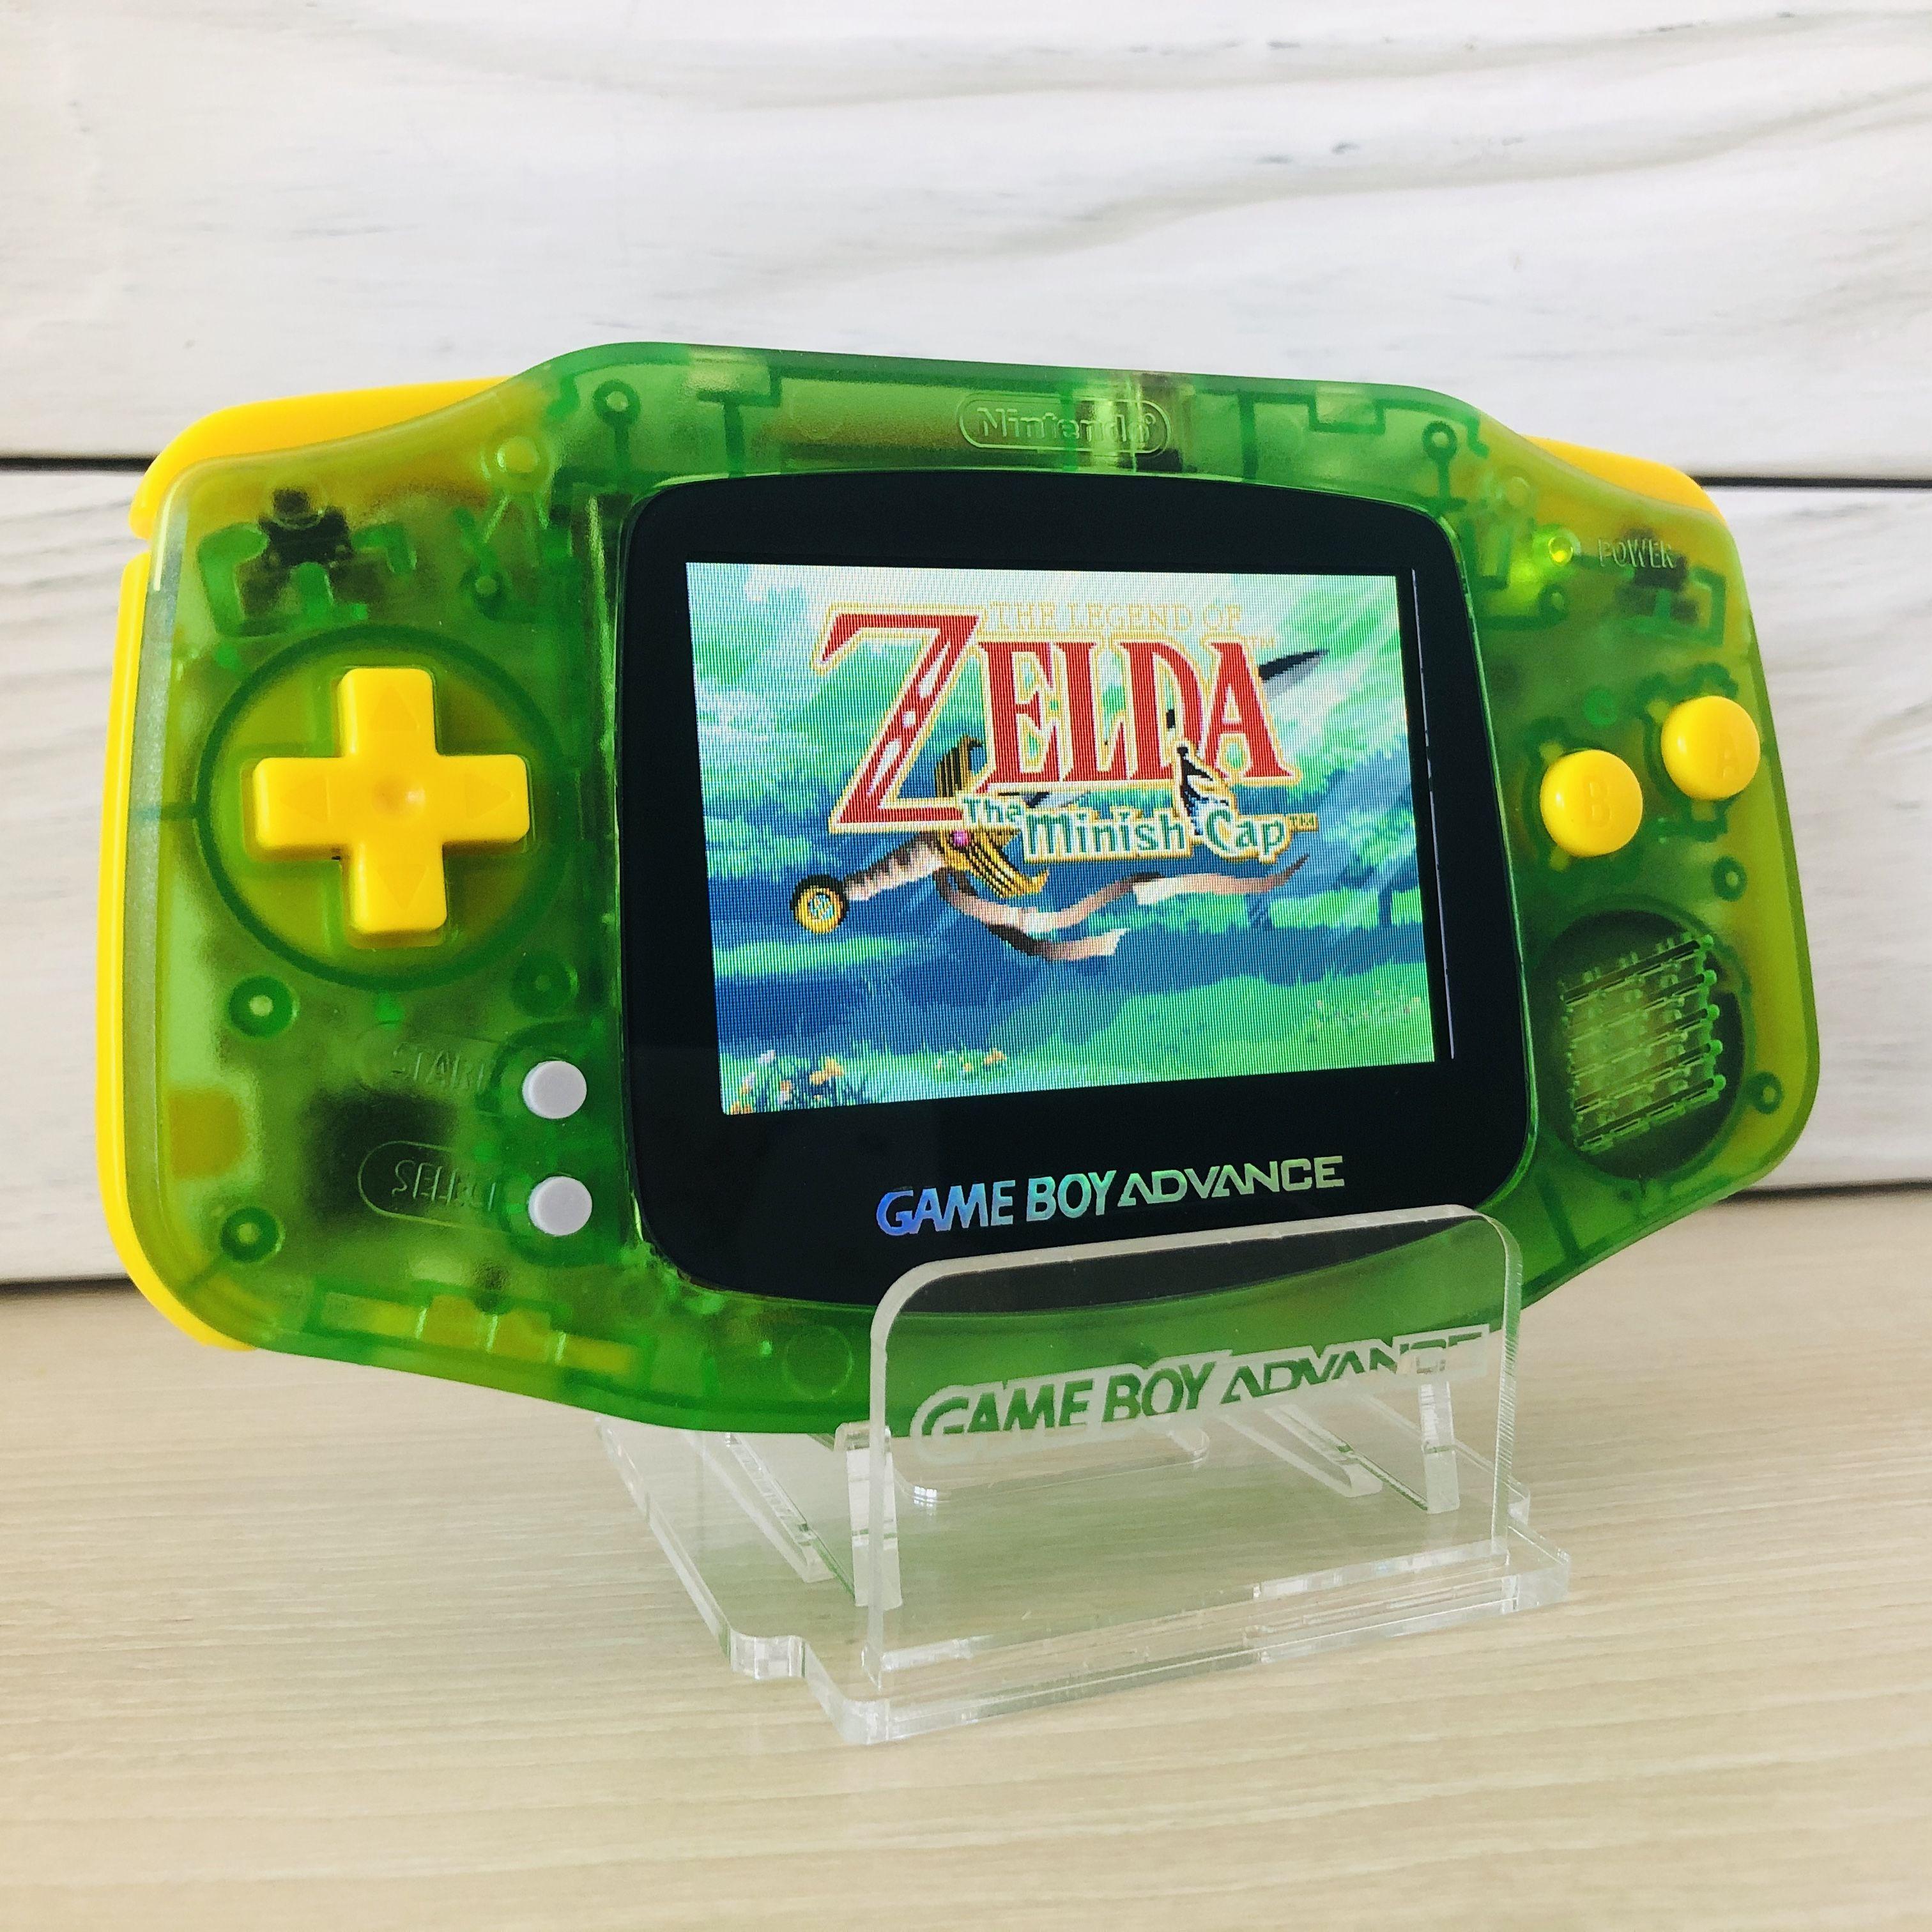 Rechargeable Ips V2 Game Boy Advance Zelda Inspired Etsy Game Boy Advance Gameboy Nintendo Game Boy Advance